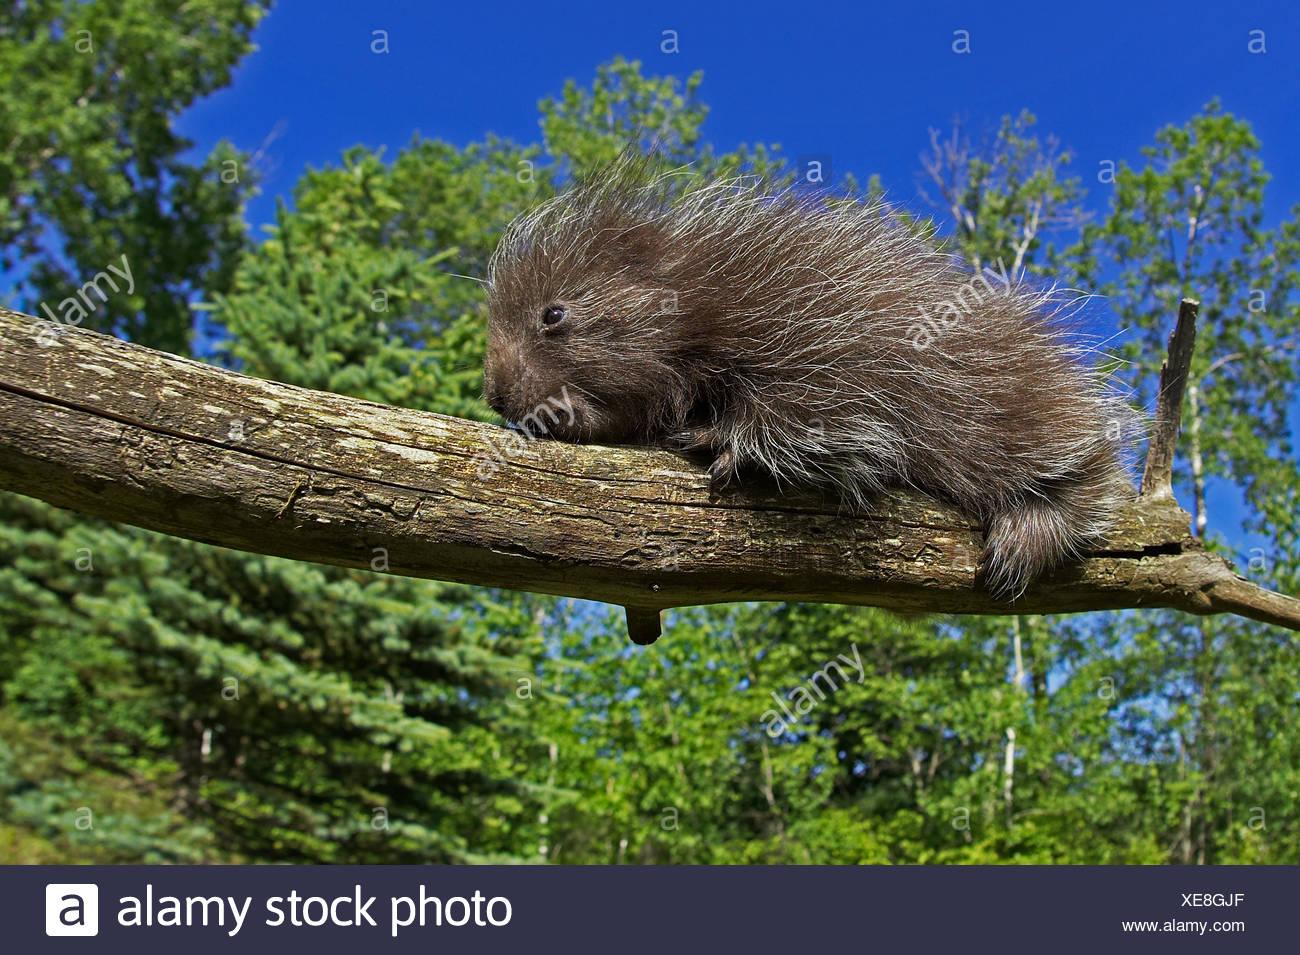 Common Porcupine Erethizon dorsatum Pine County Minnesota USA Stock Photo